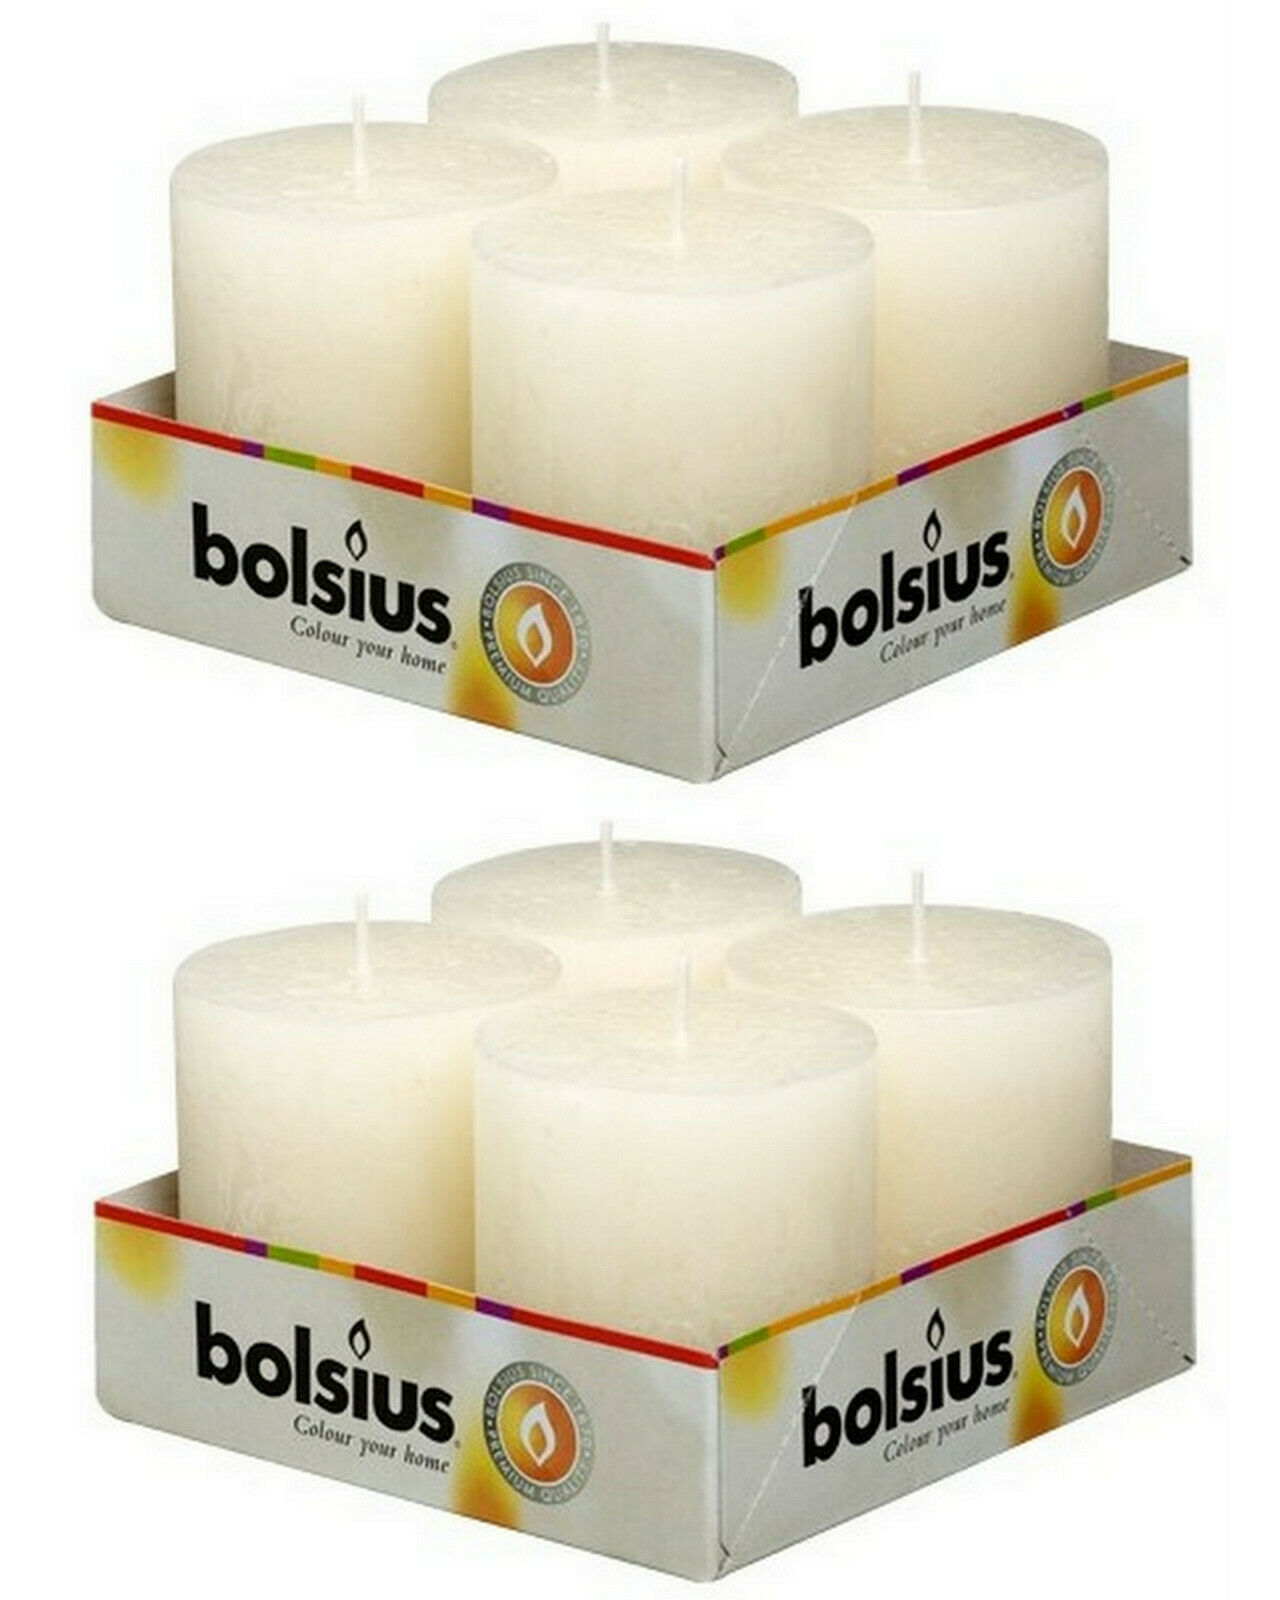 8 Stück Bolsius Rustik Stumpenkerzen 80x68 mm Qualitäts-Kerzen Candle Rustic - Elfenbein